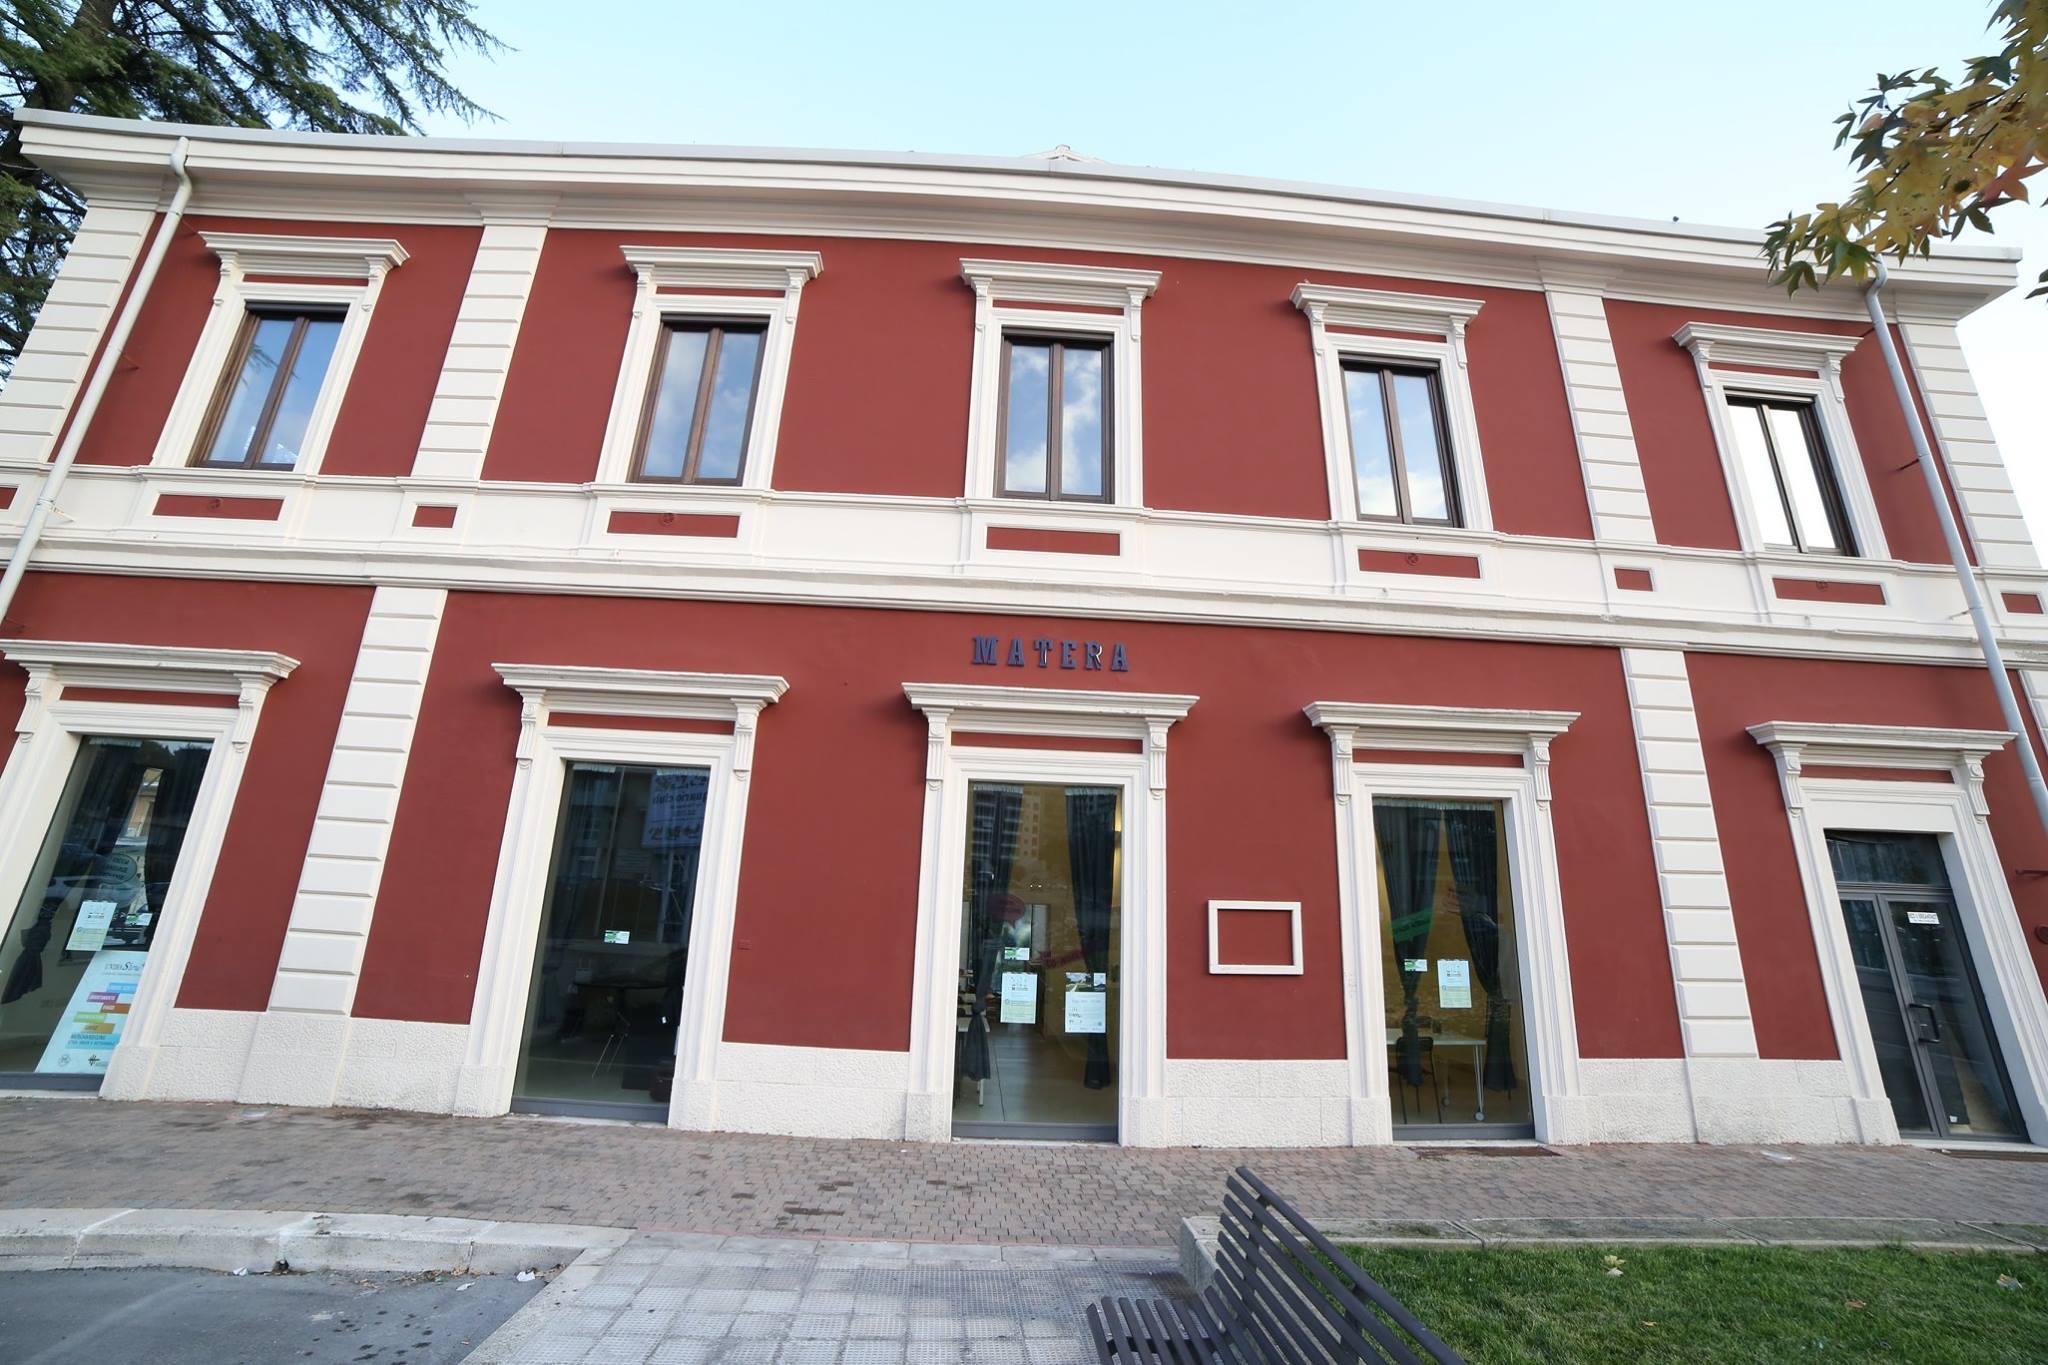 Materahub e ConUnibas insieme per favorire l'educazione imprenditoriale in Basilicata